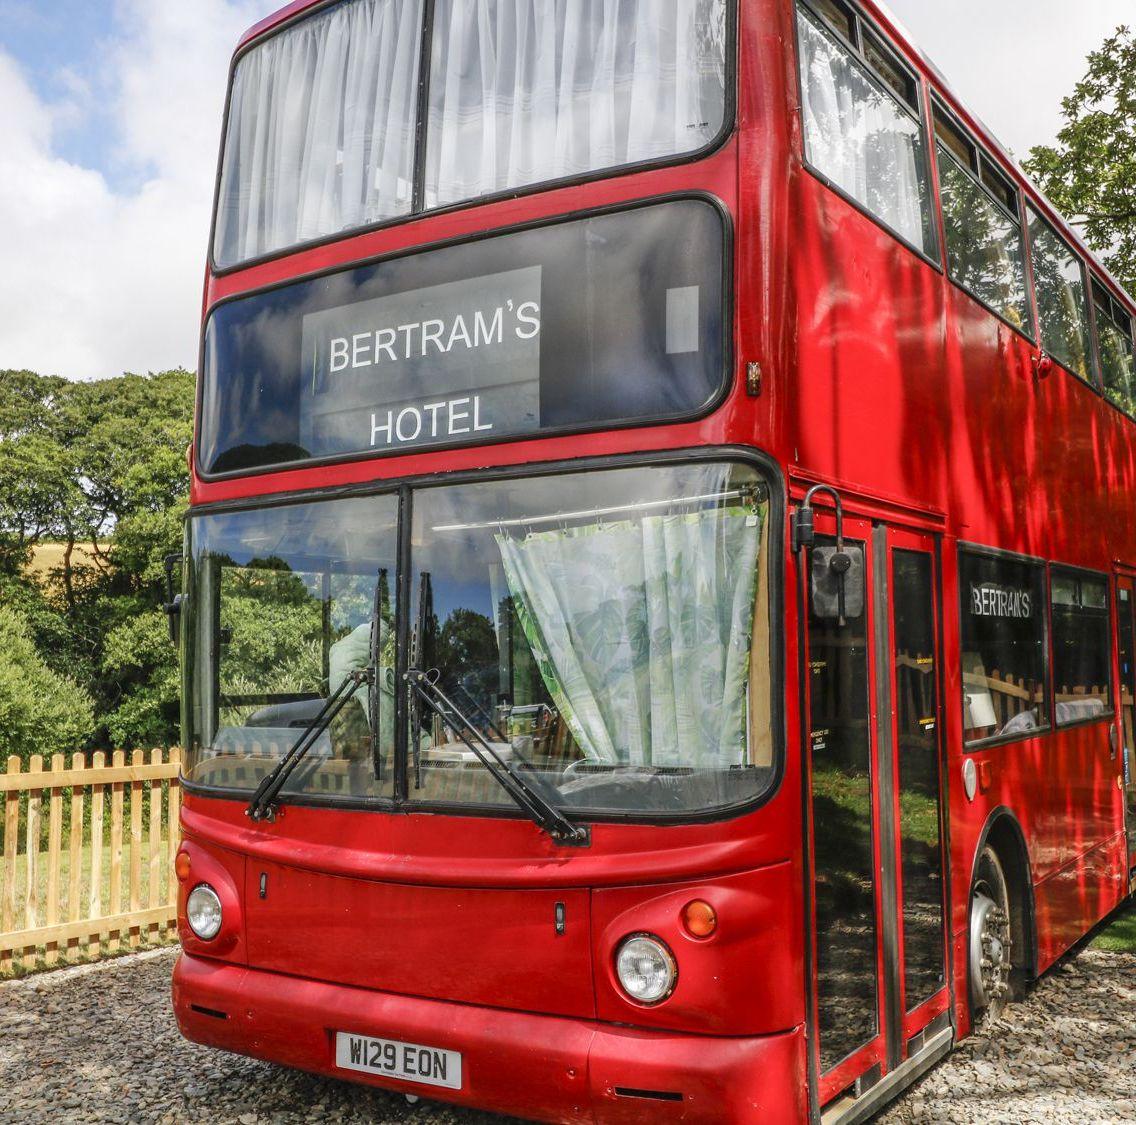 Bertram's Hotel: Διαμονή στο κόκκινο λεωφορείο της Αγγλίας - itravelling.gr